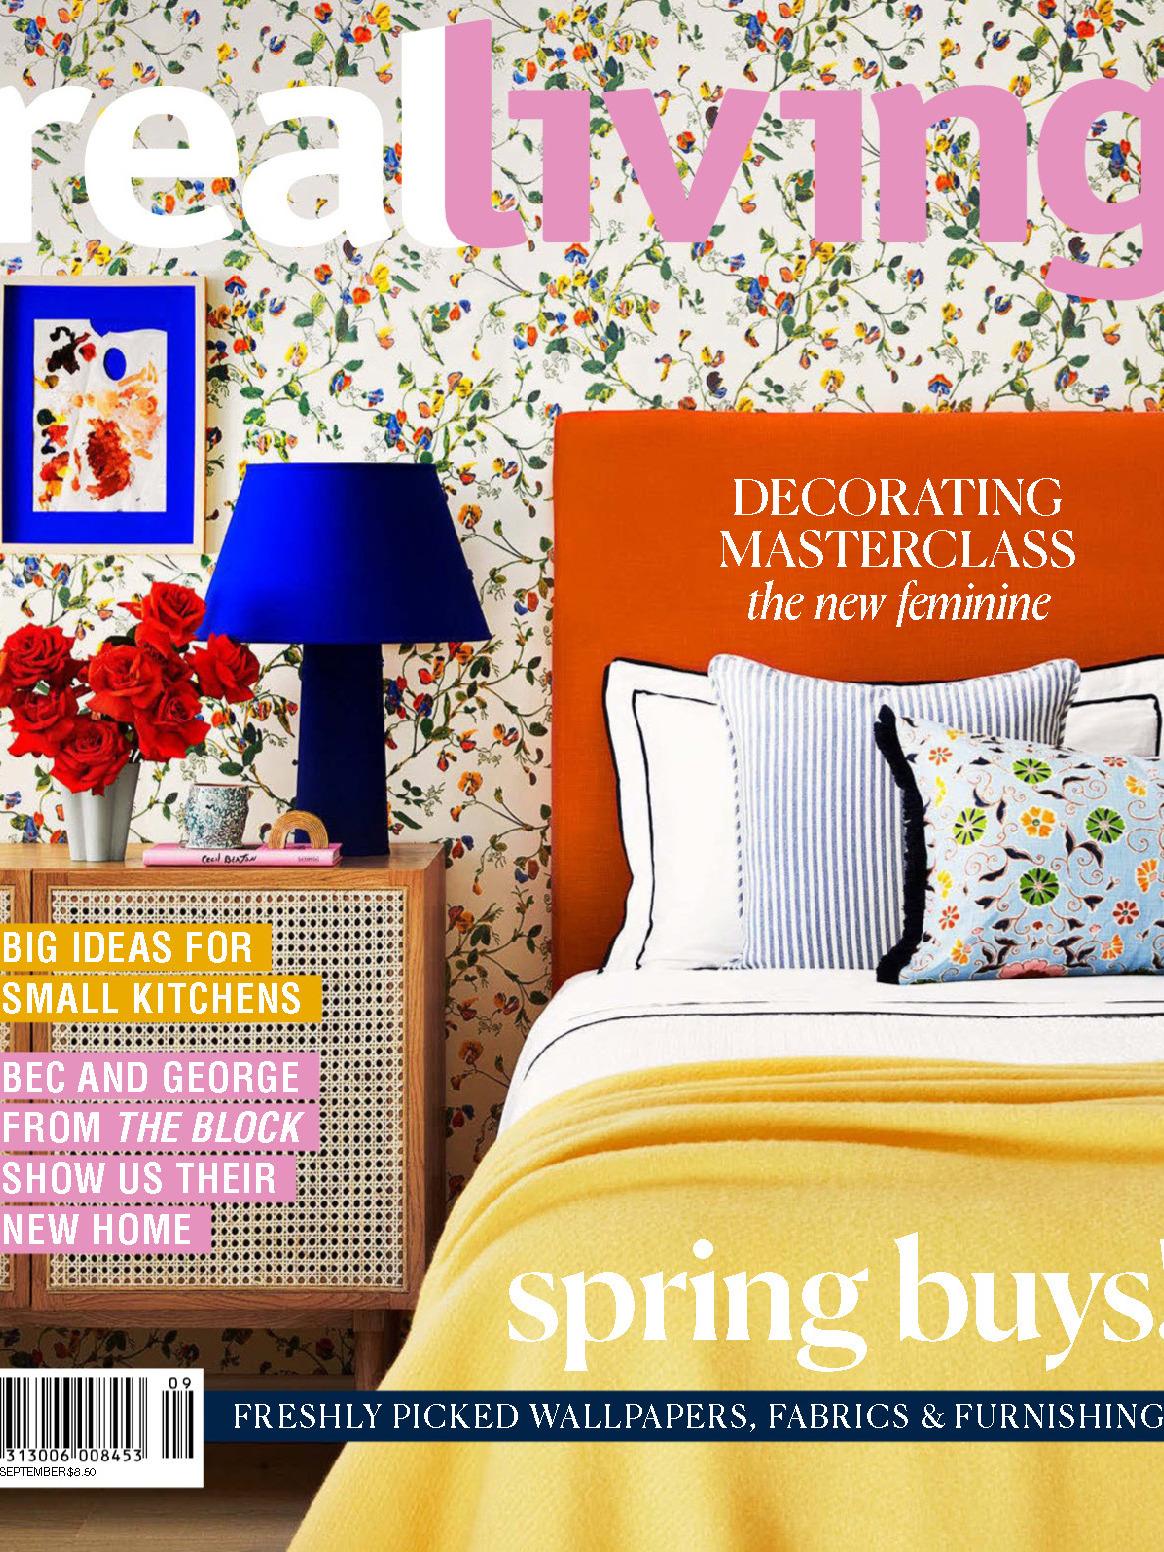 《Real Living》澳大利亚室内设计趋势杂志2019年09月号